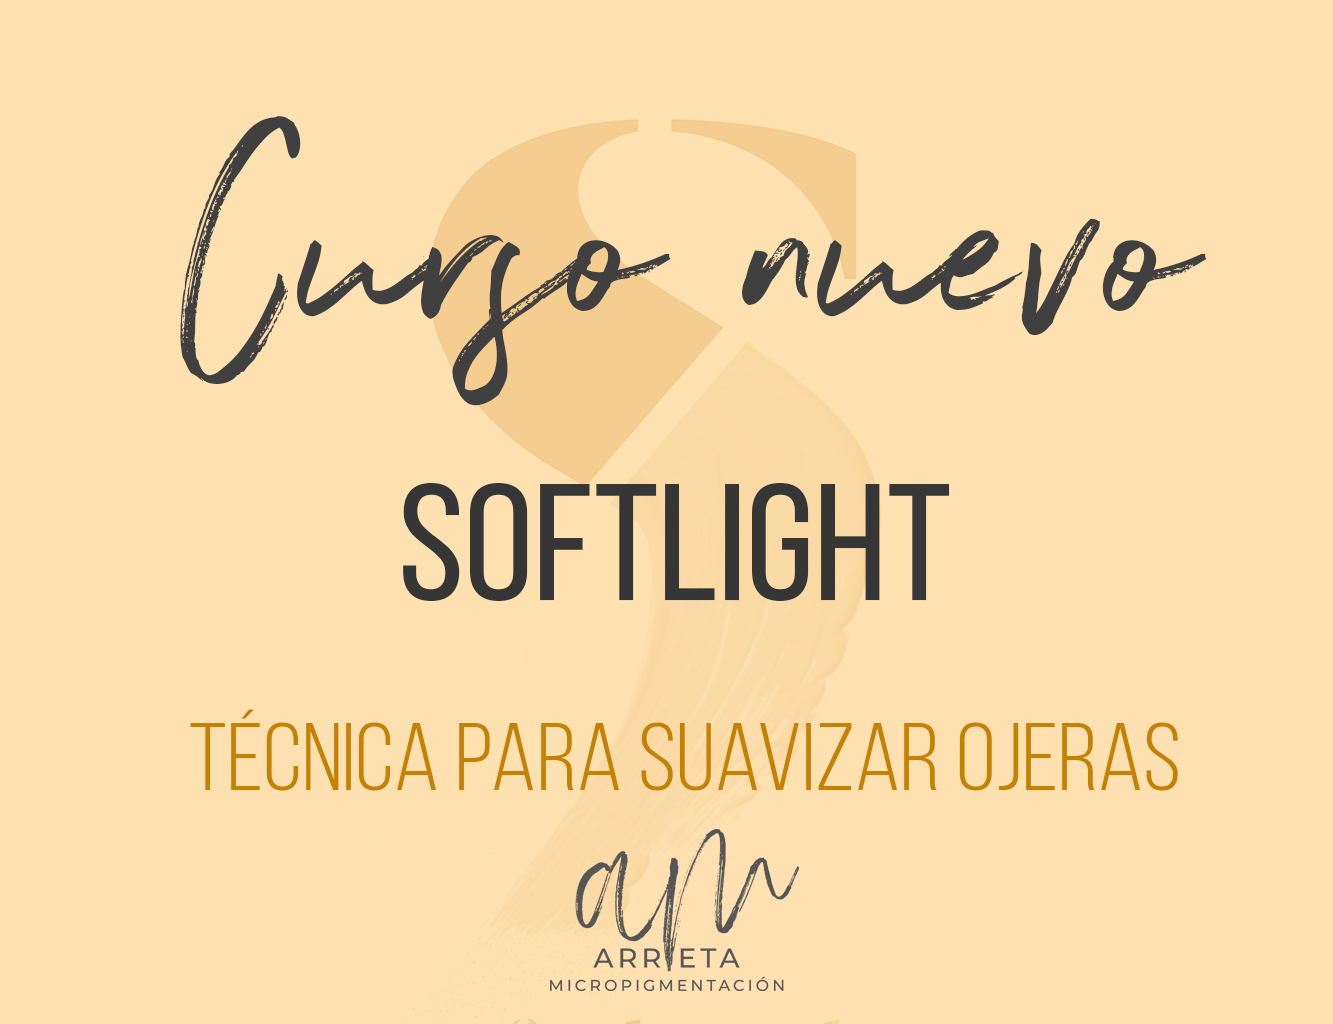 curso softlight academia arrieta micropigmentacion